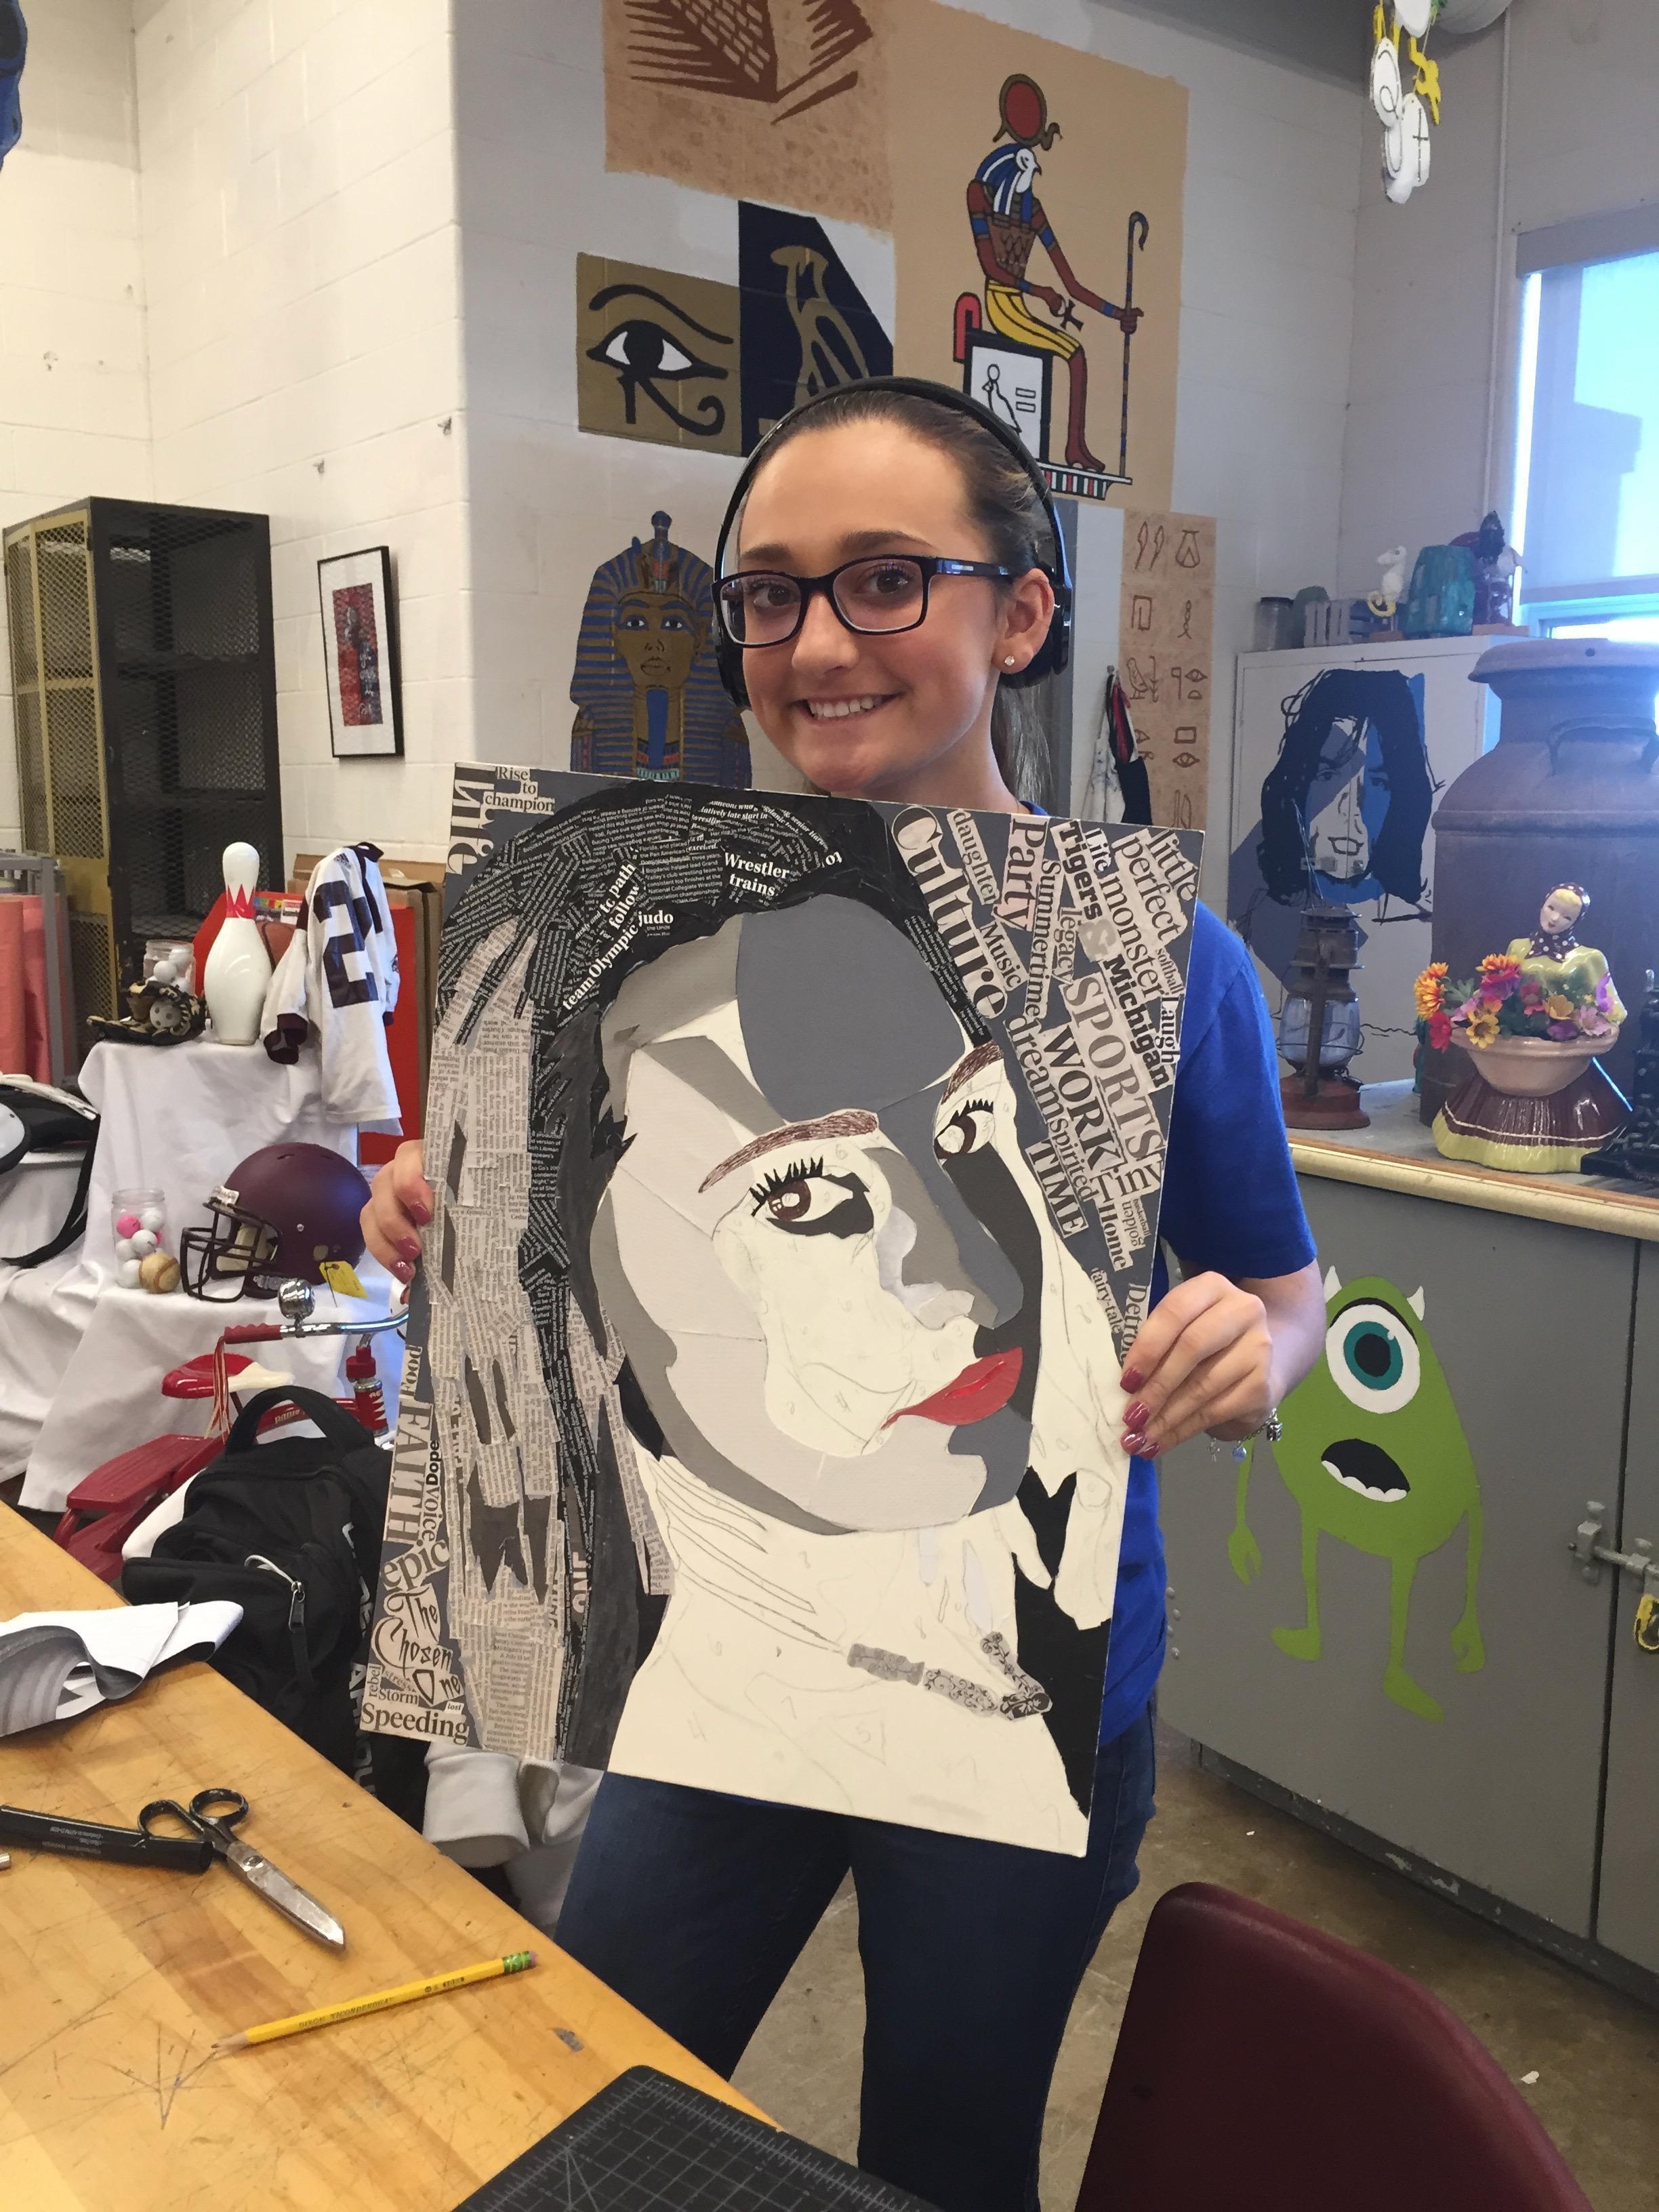 Sophie Warsko showing her artwork